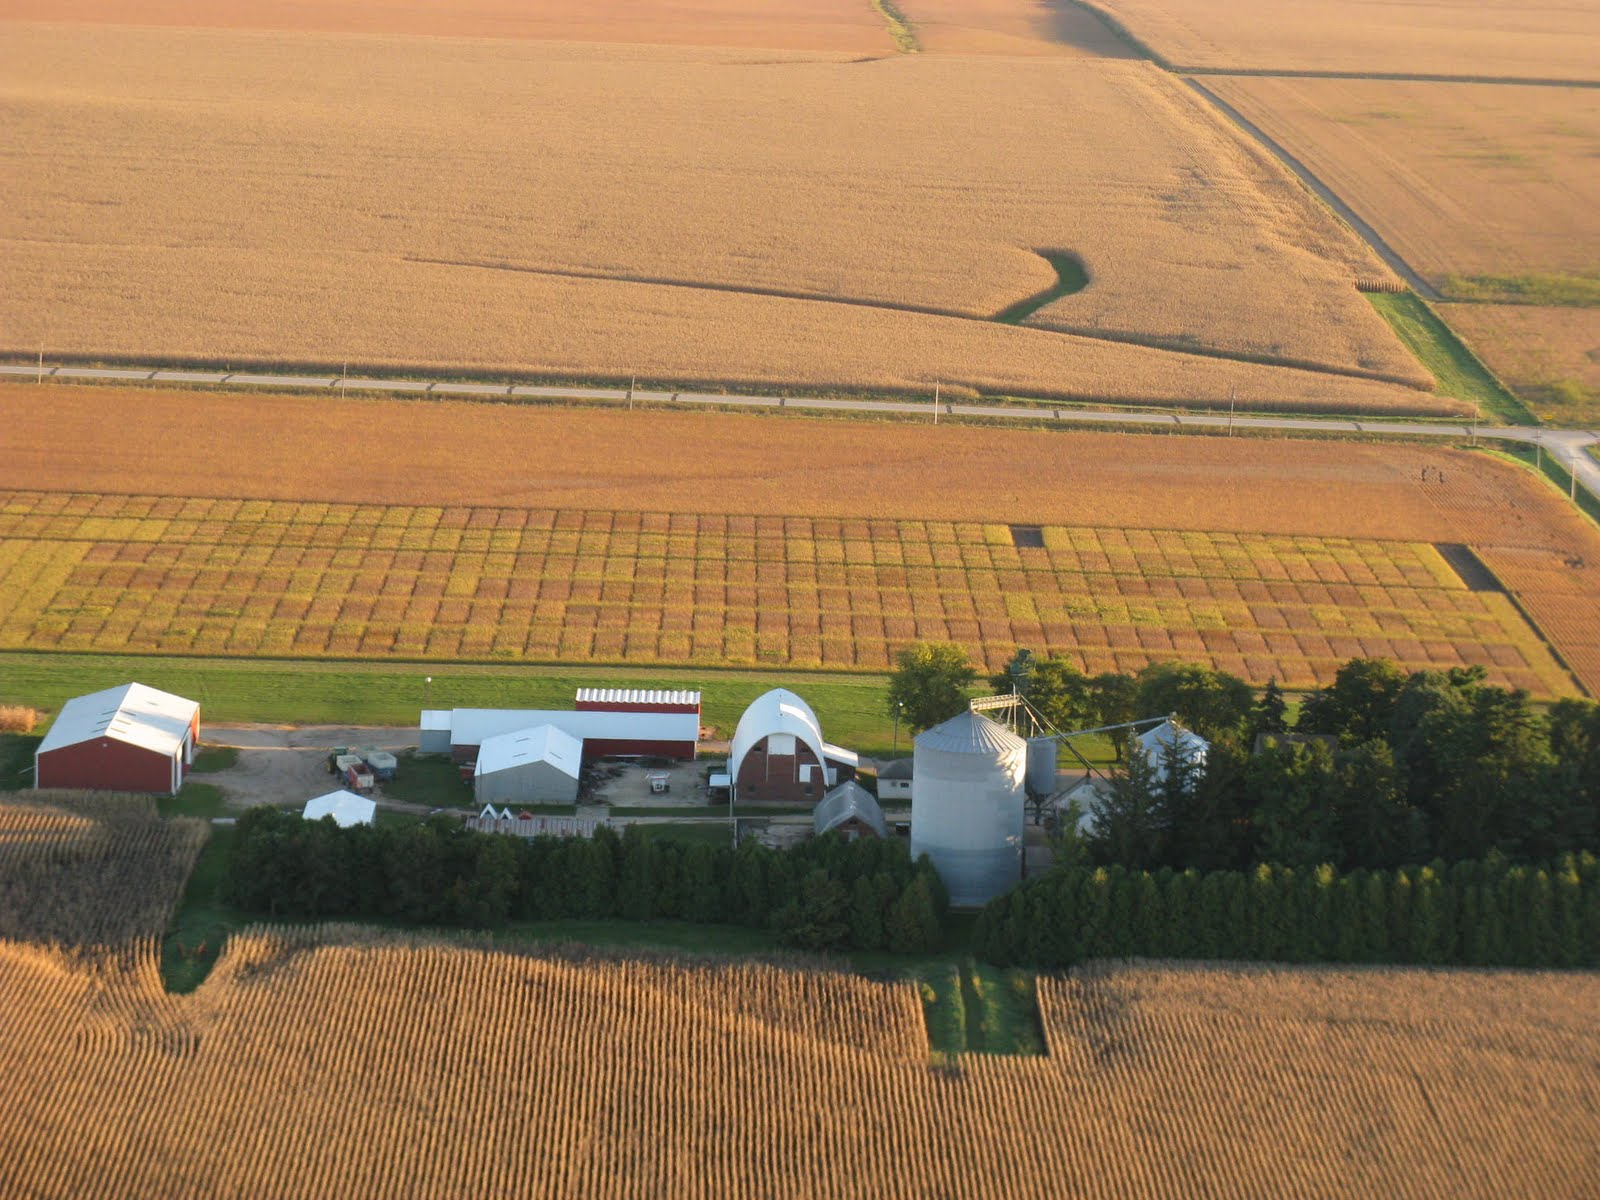 Photo: Golden quilt of soybean test plots at Isley farm west of Cedar Falls